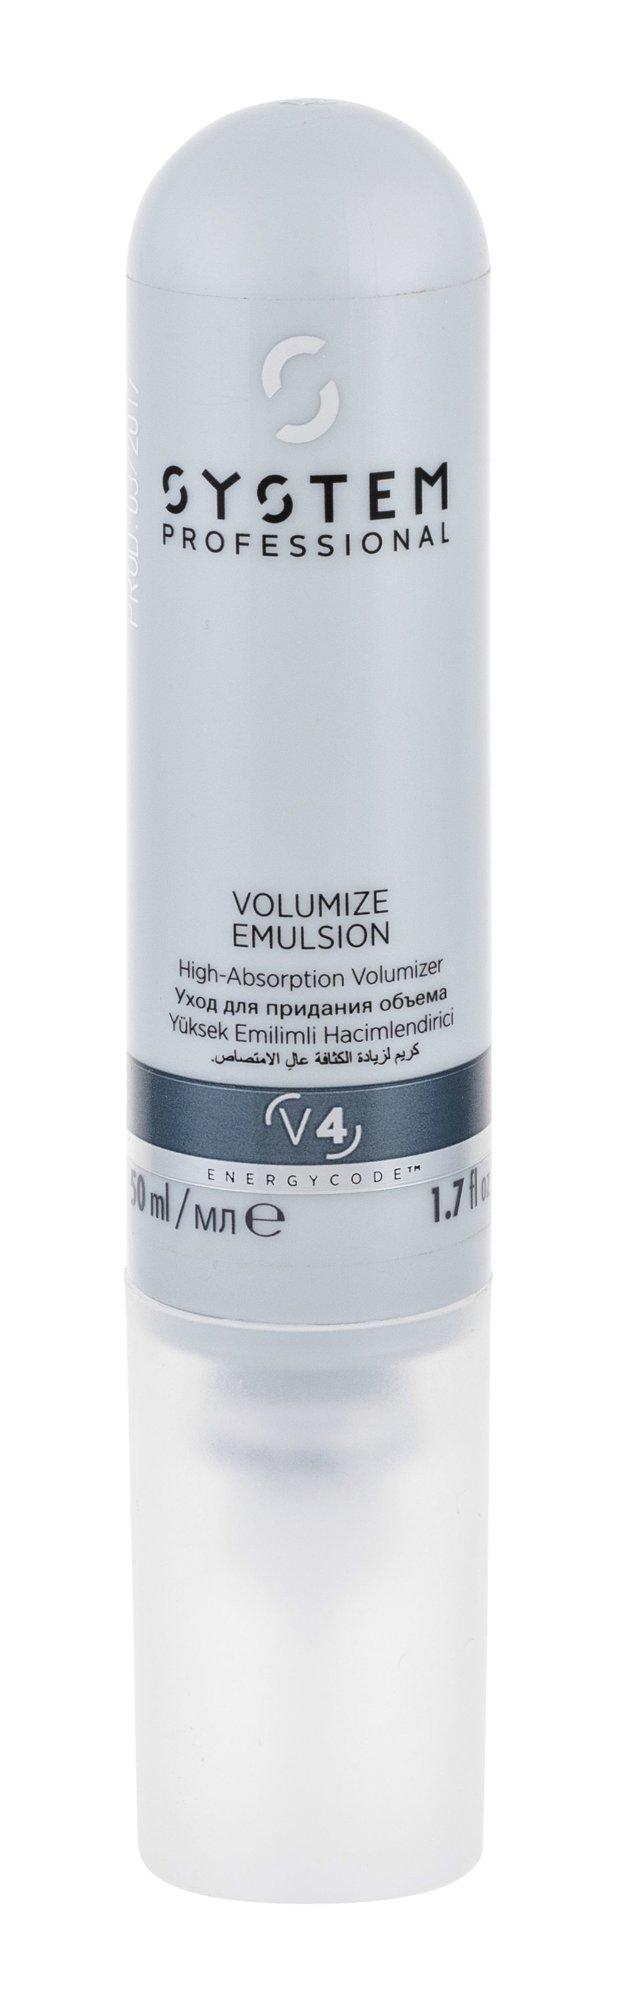 System Professional Volumize Hair Balm 50ml